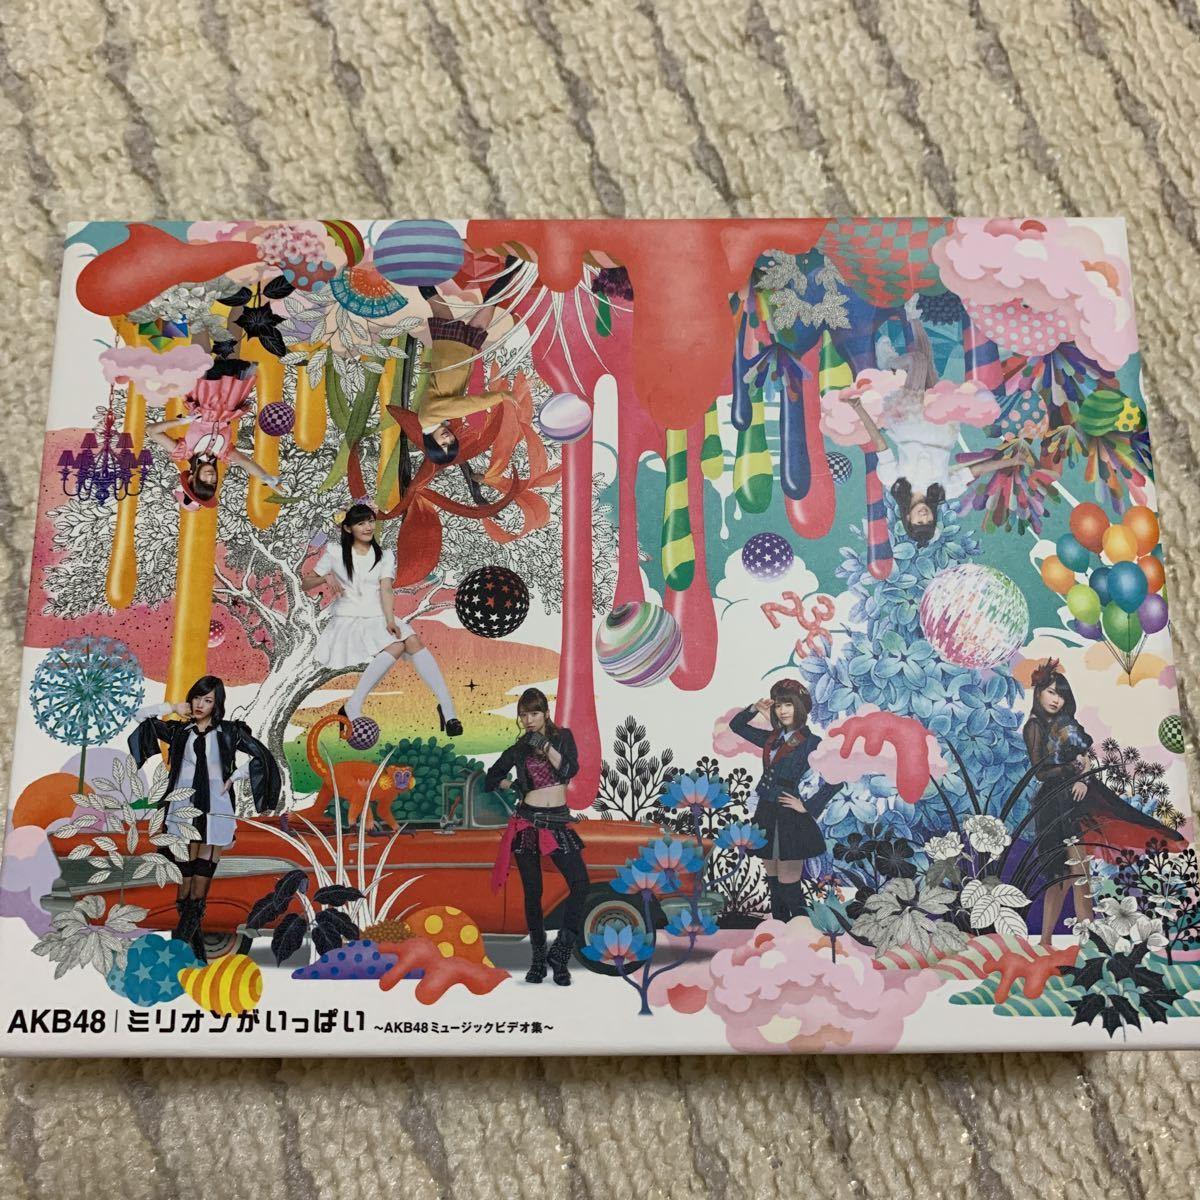 AKB48 DVD ミリオンがいっぱい~ AKB48ミュージックビデオ集 スペシャルBOX 6枚組 AKB48定価: ¥ 11,931 激安 格安 限定 です